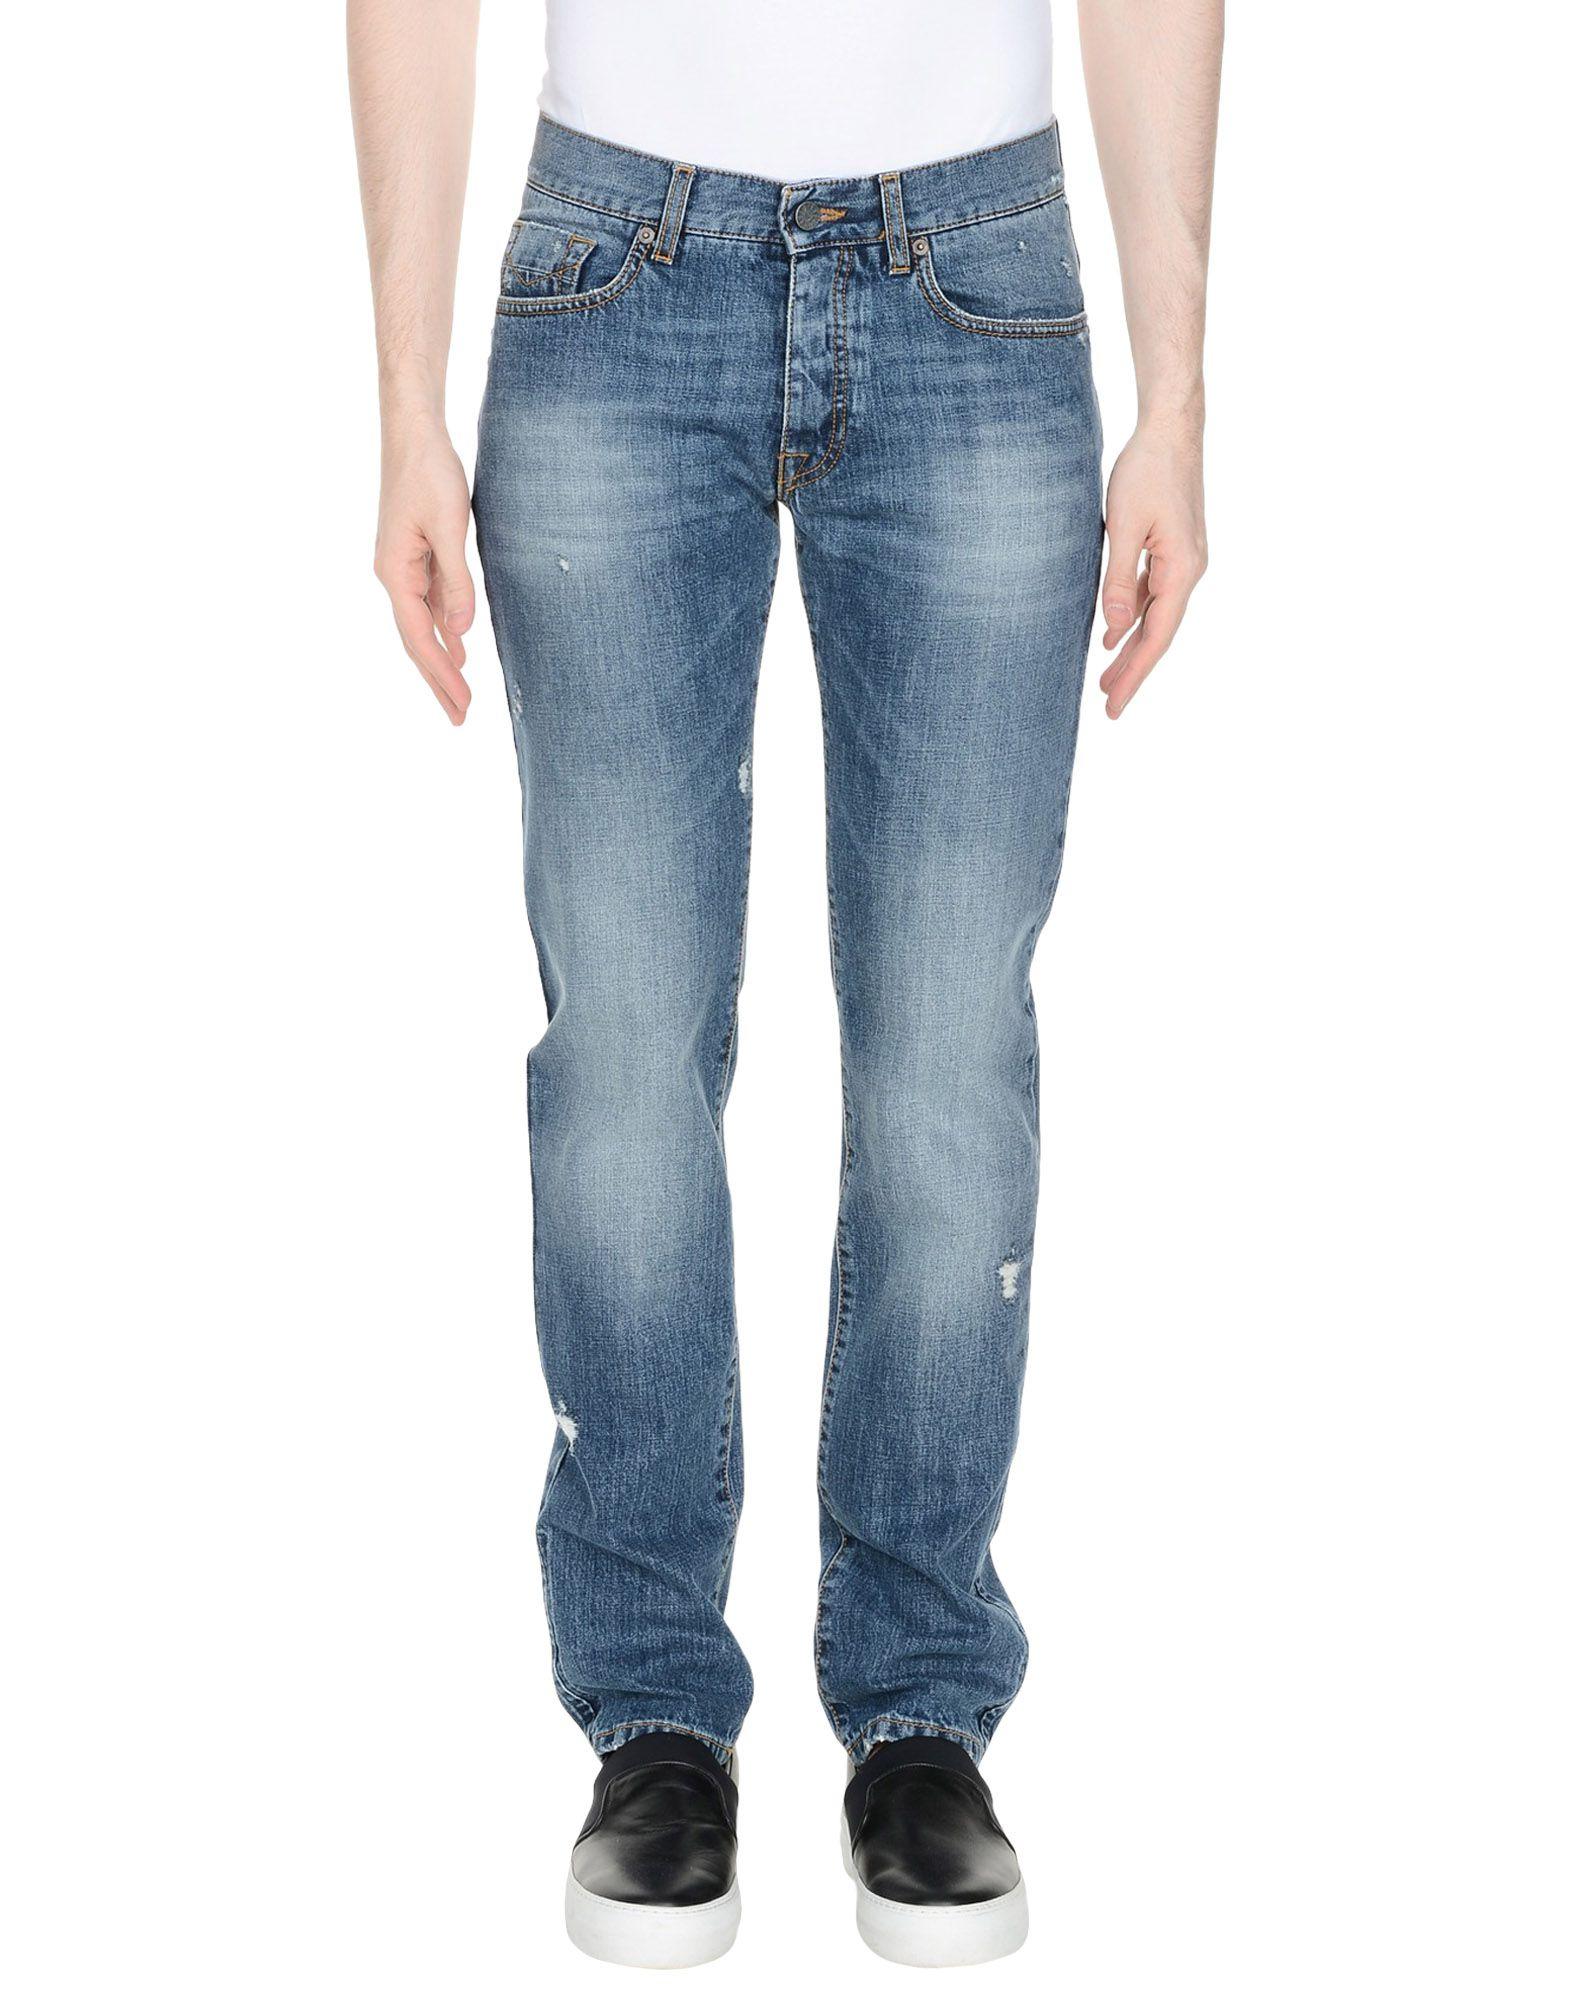 Pantaloni Jeans Bikkembergs Uomo - Acquista online su